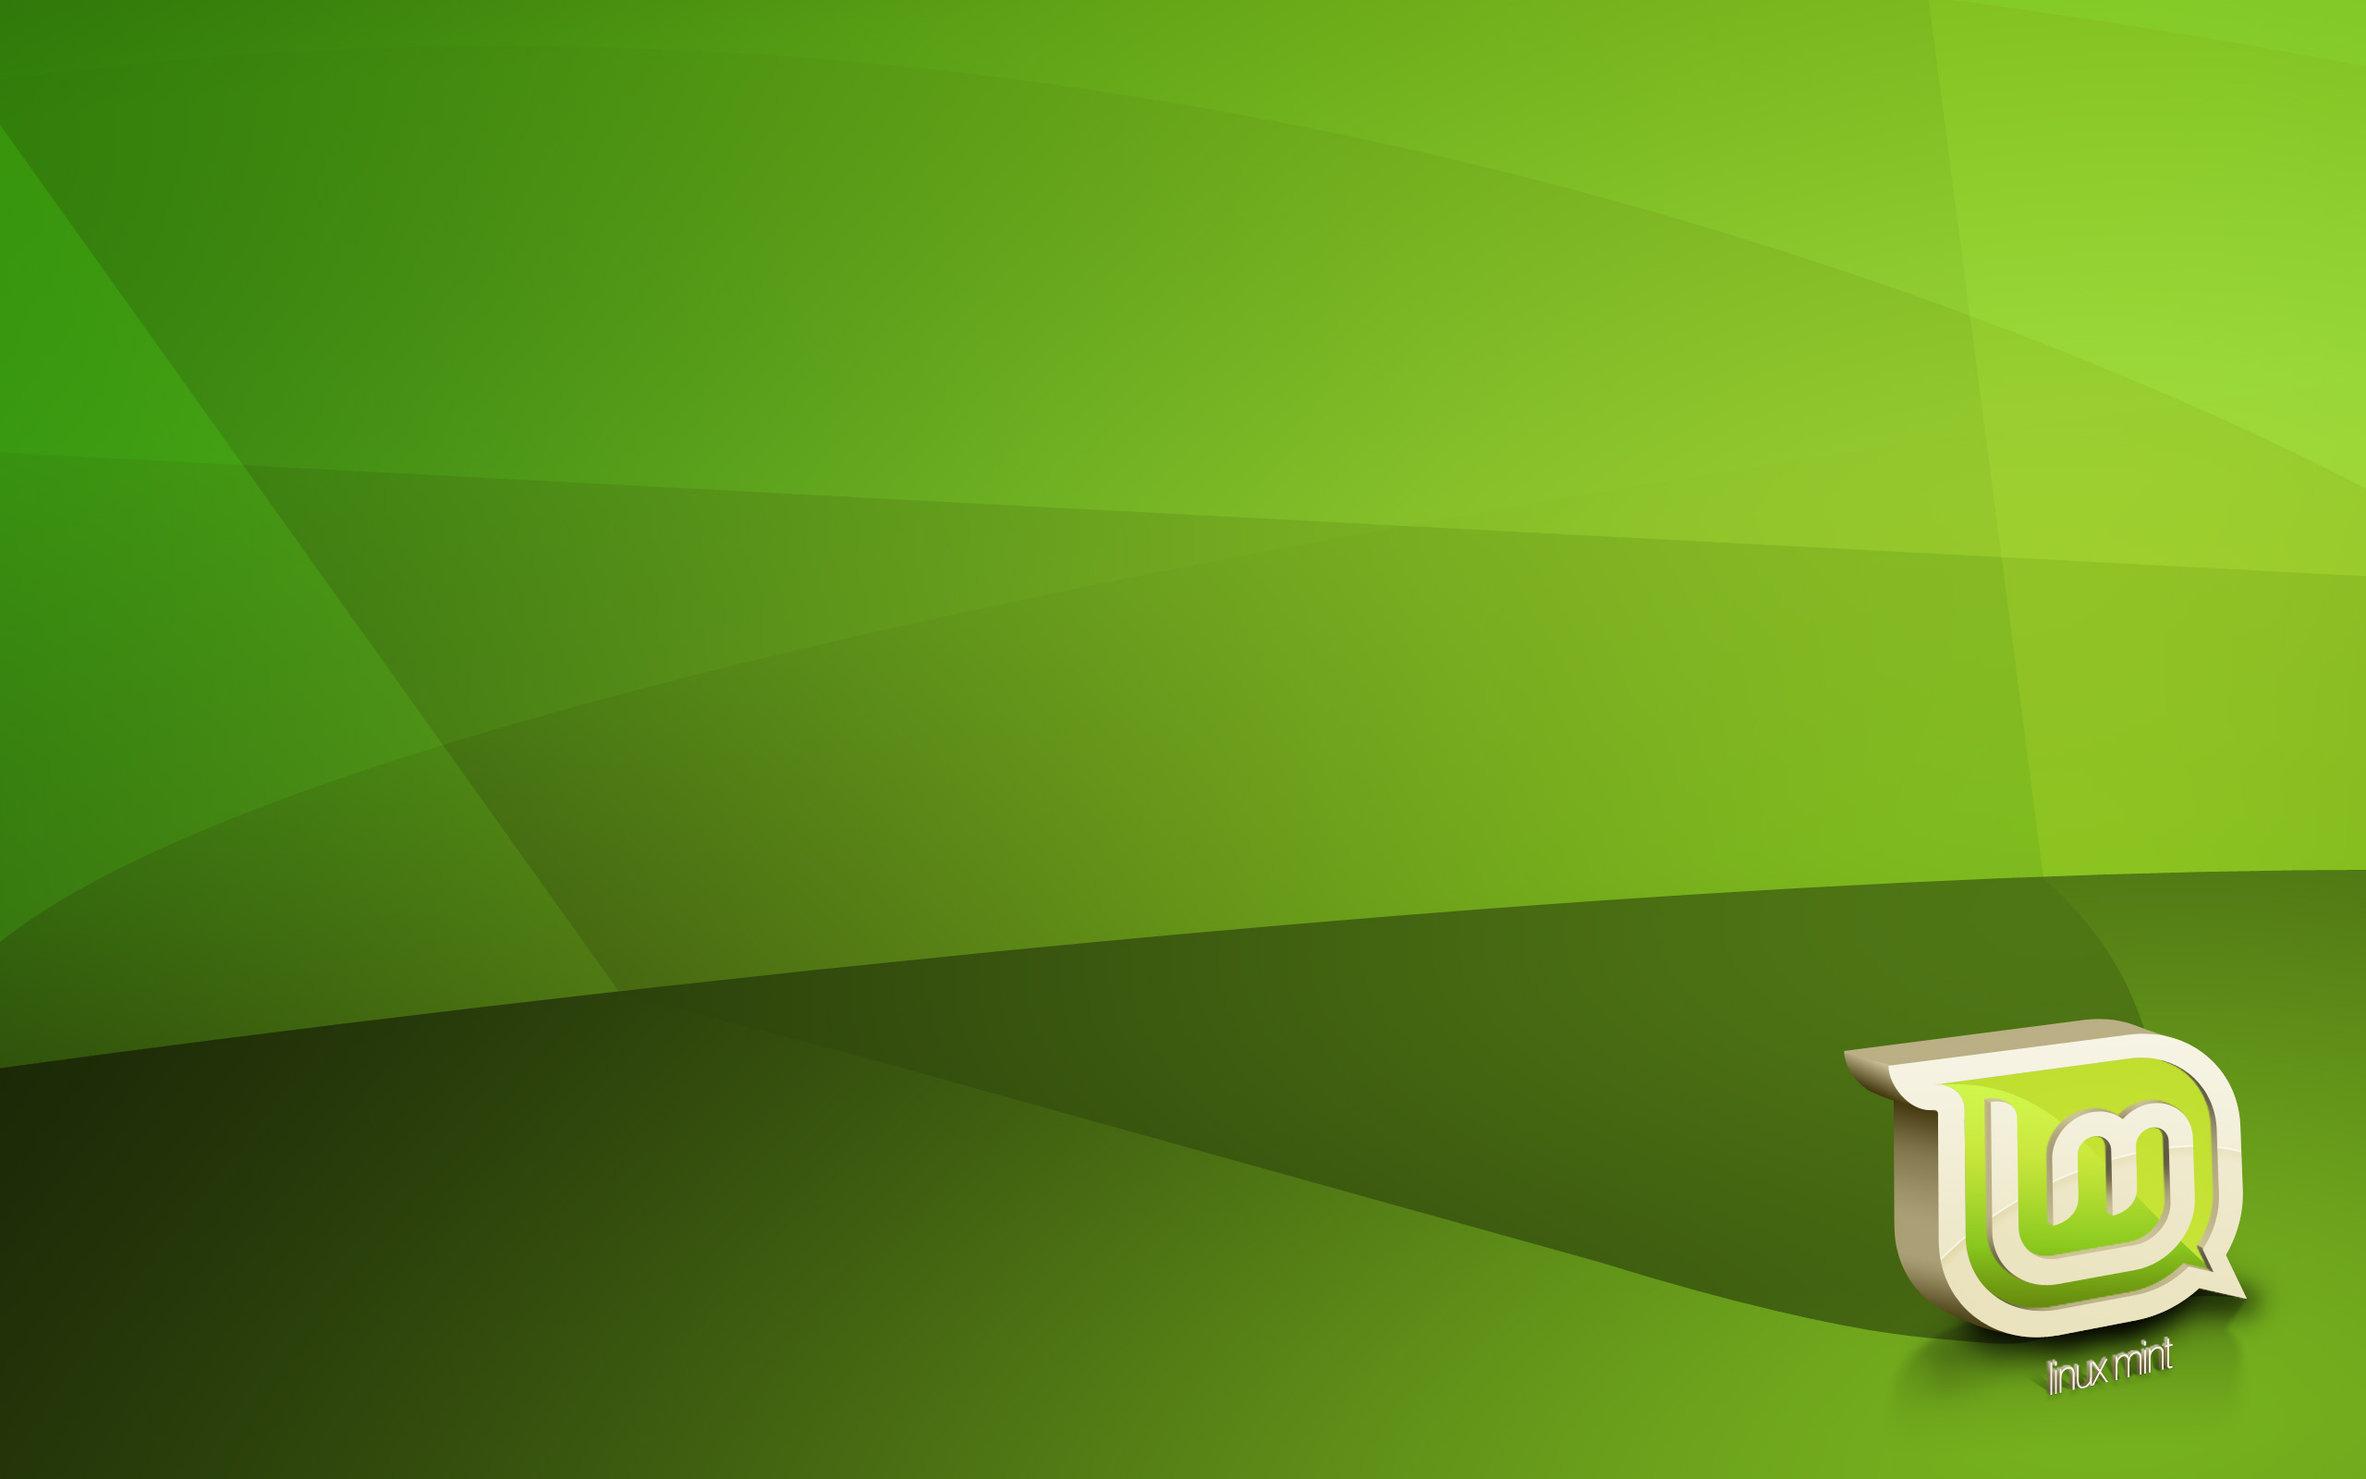 Linux Mint Wallpaper 02   Wide by deadheir 2366x1479